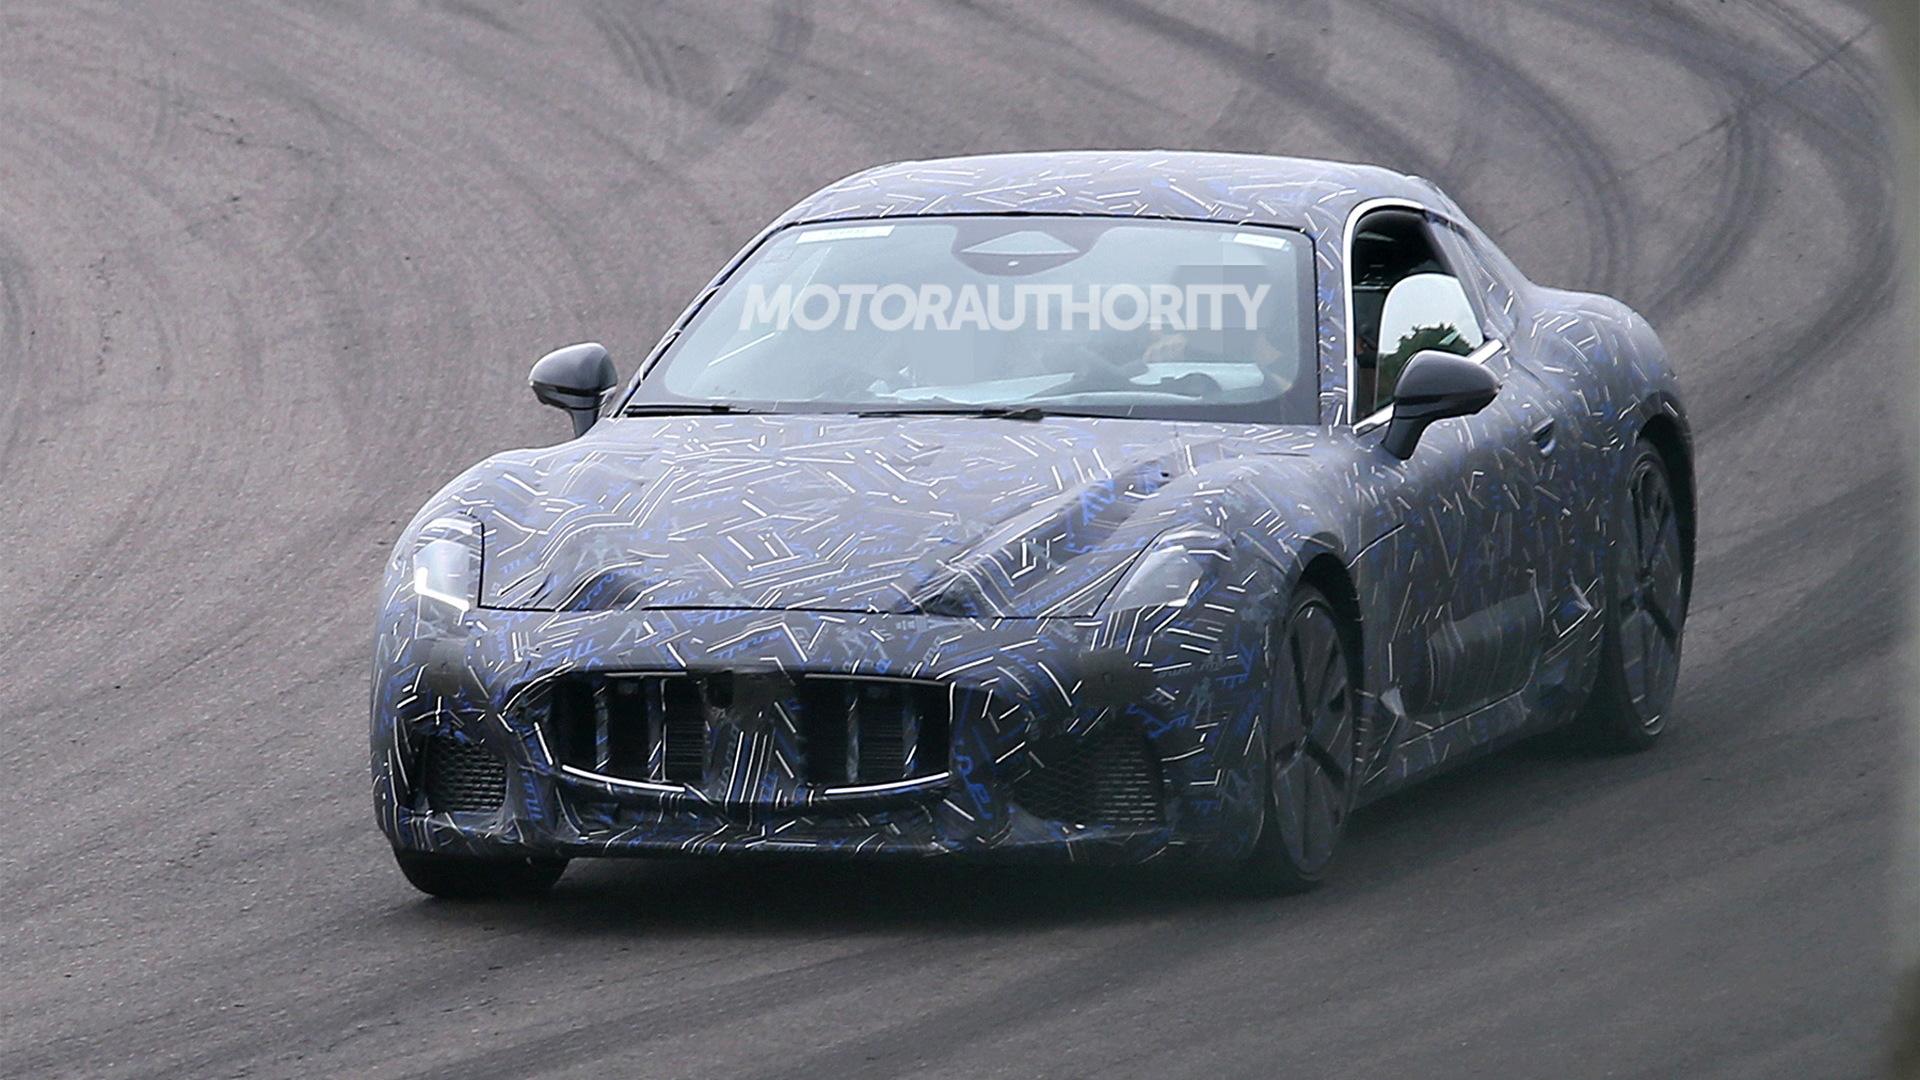 2023 Maserati GranTurismo spy shots - Photo credit:S. Baldauf/SB-Medien